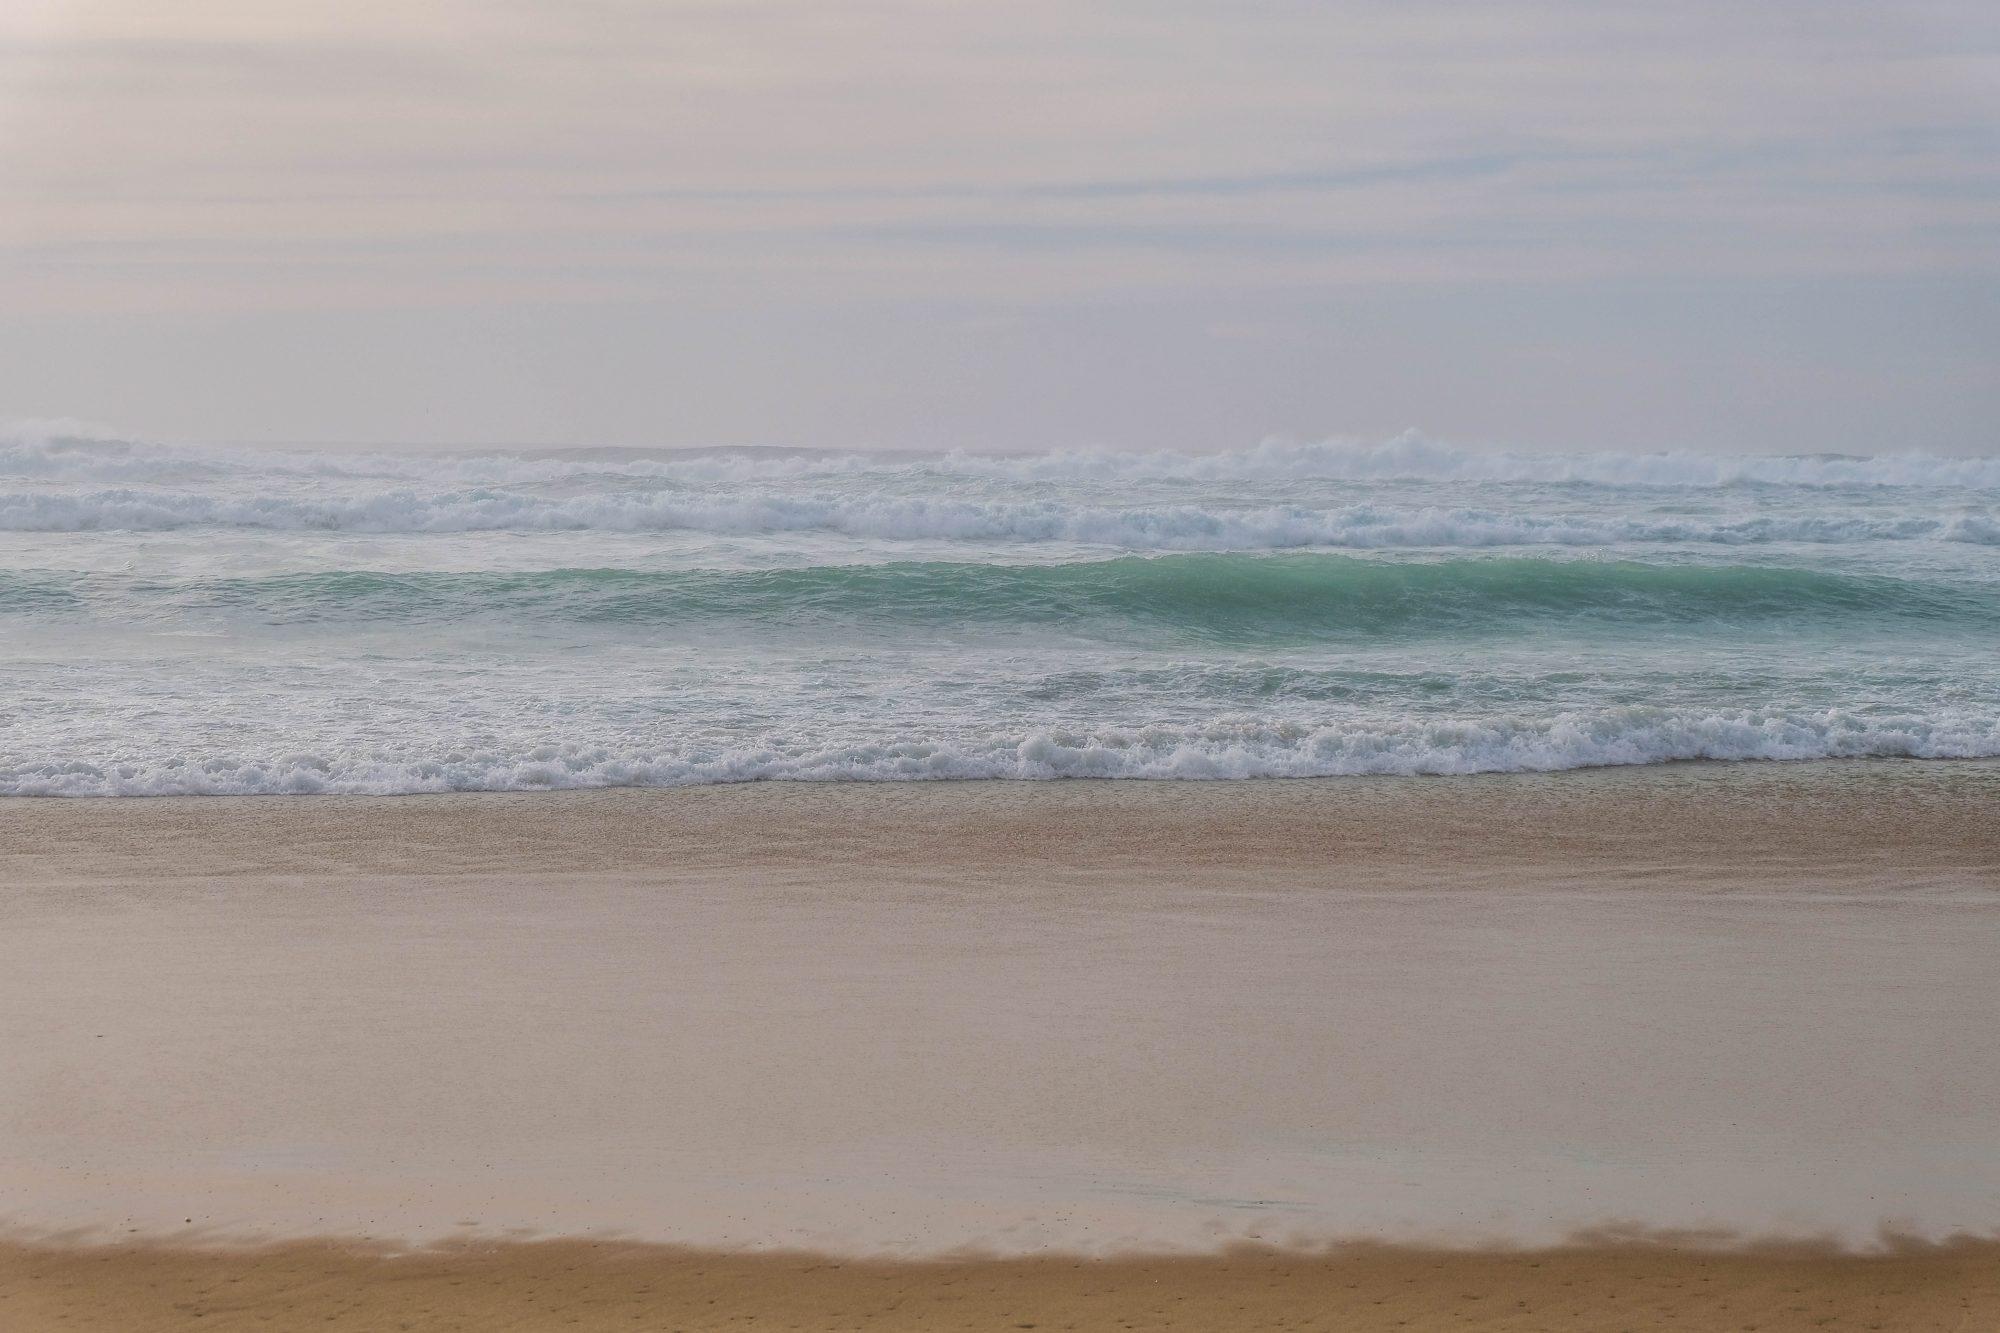 Bel océan Atlantique